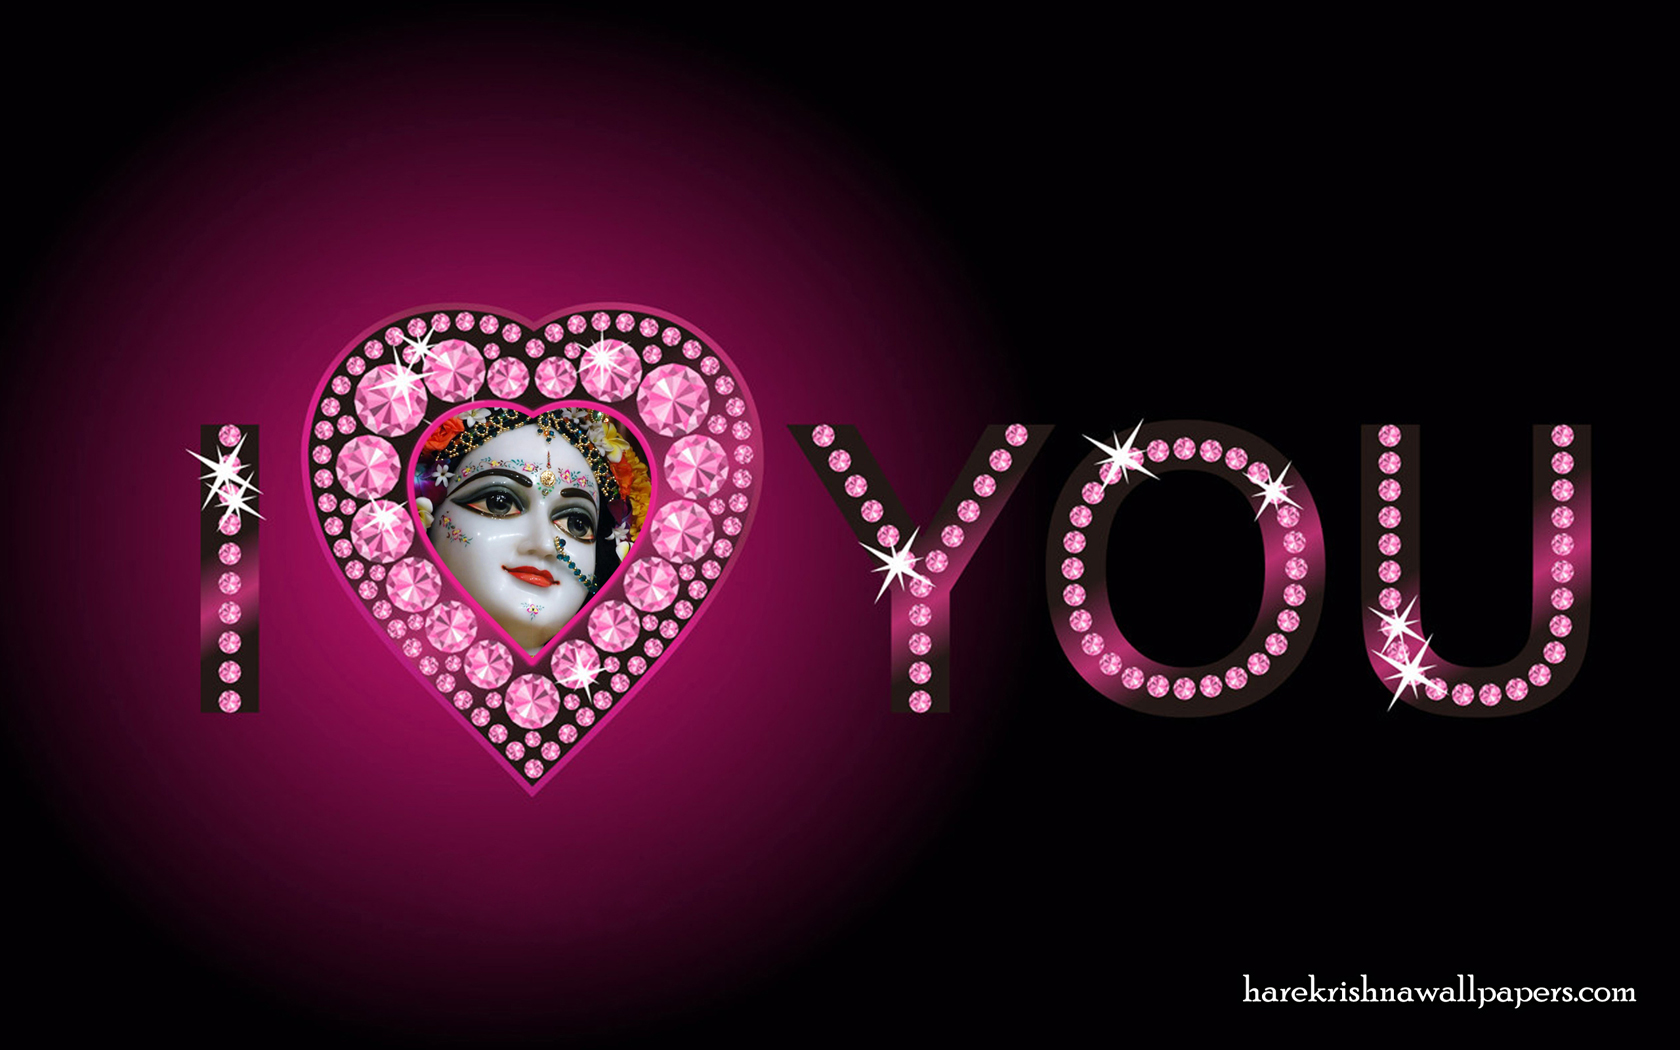 I Love You Radharani Wallpaper (013) Size 1680x1050 Download